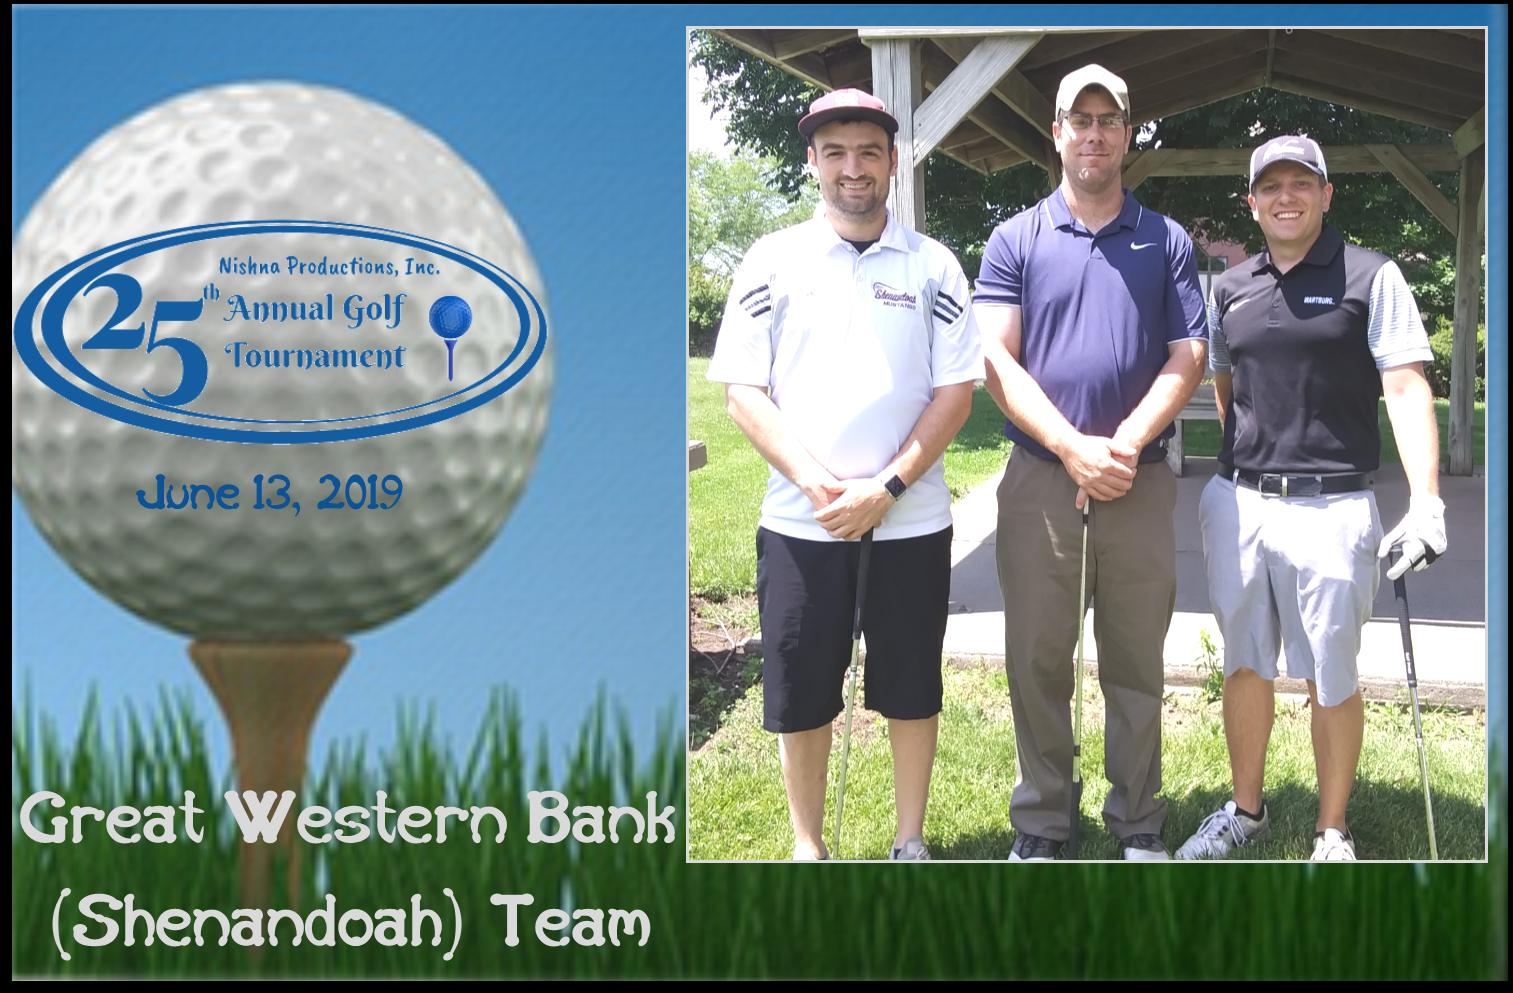 Great Western Bank Team